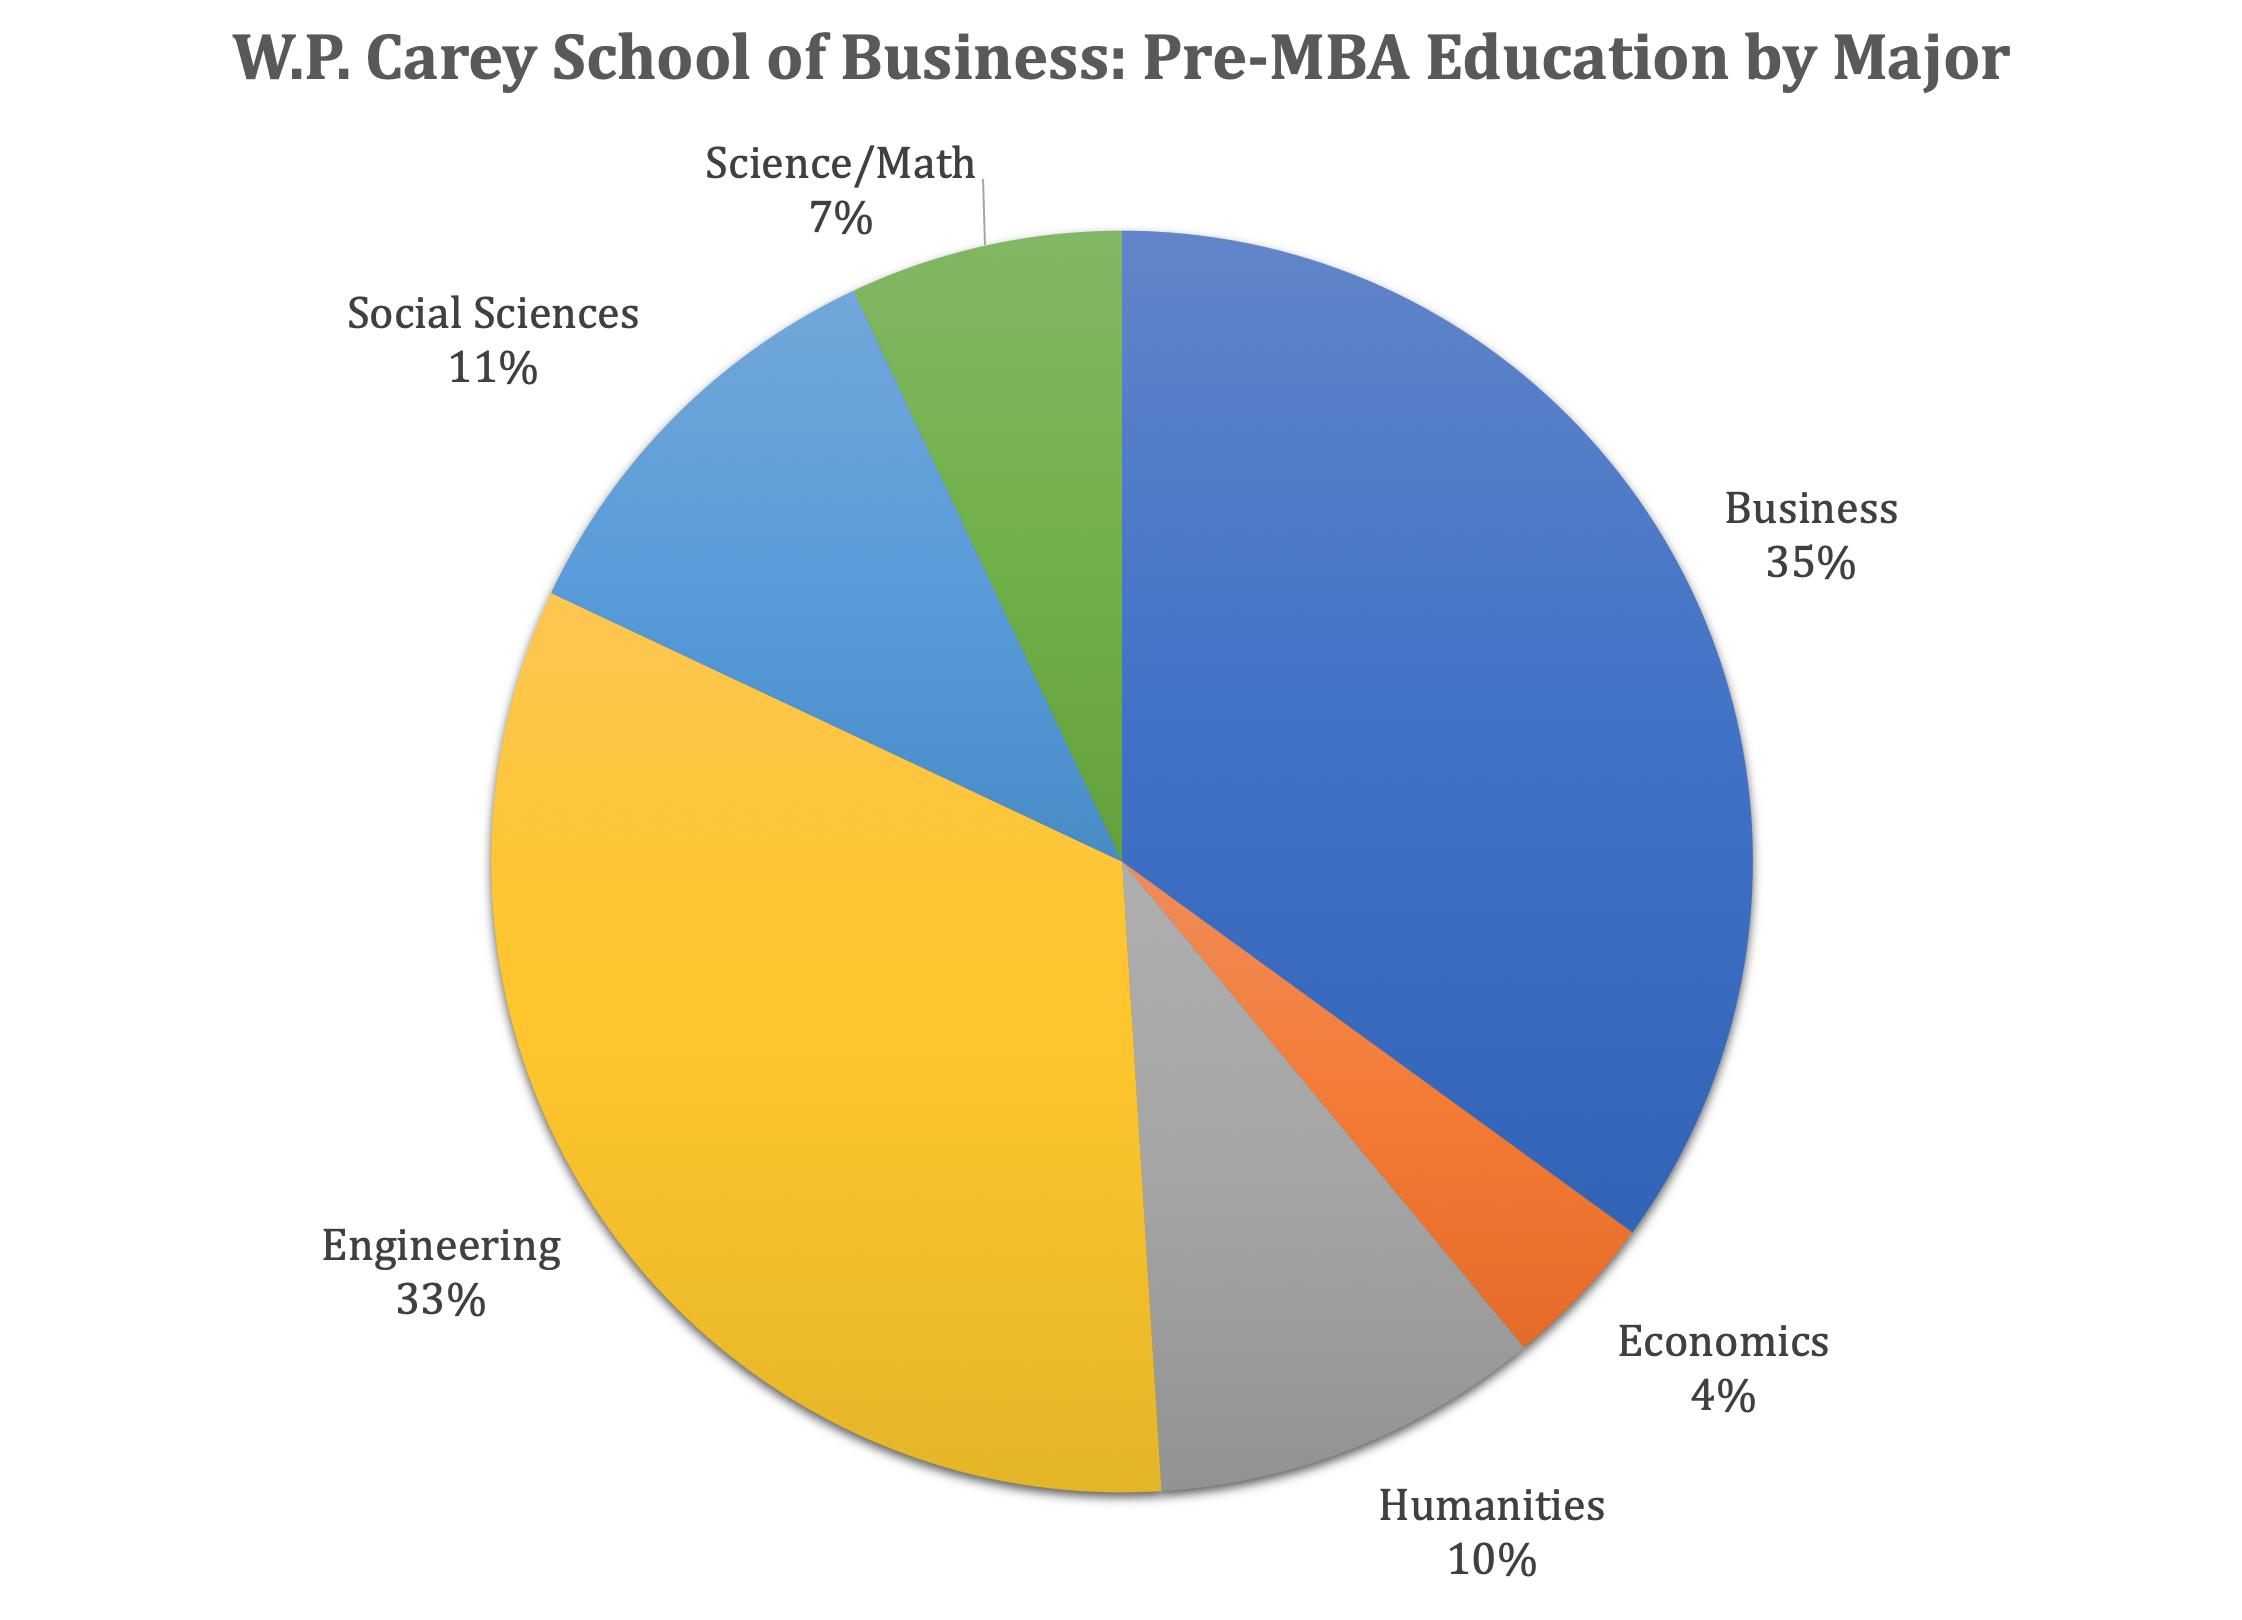 ASU MBA Program - W.P. Carey School of Business - Pre-MBA Major